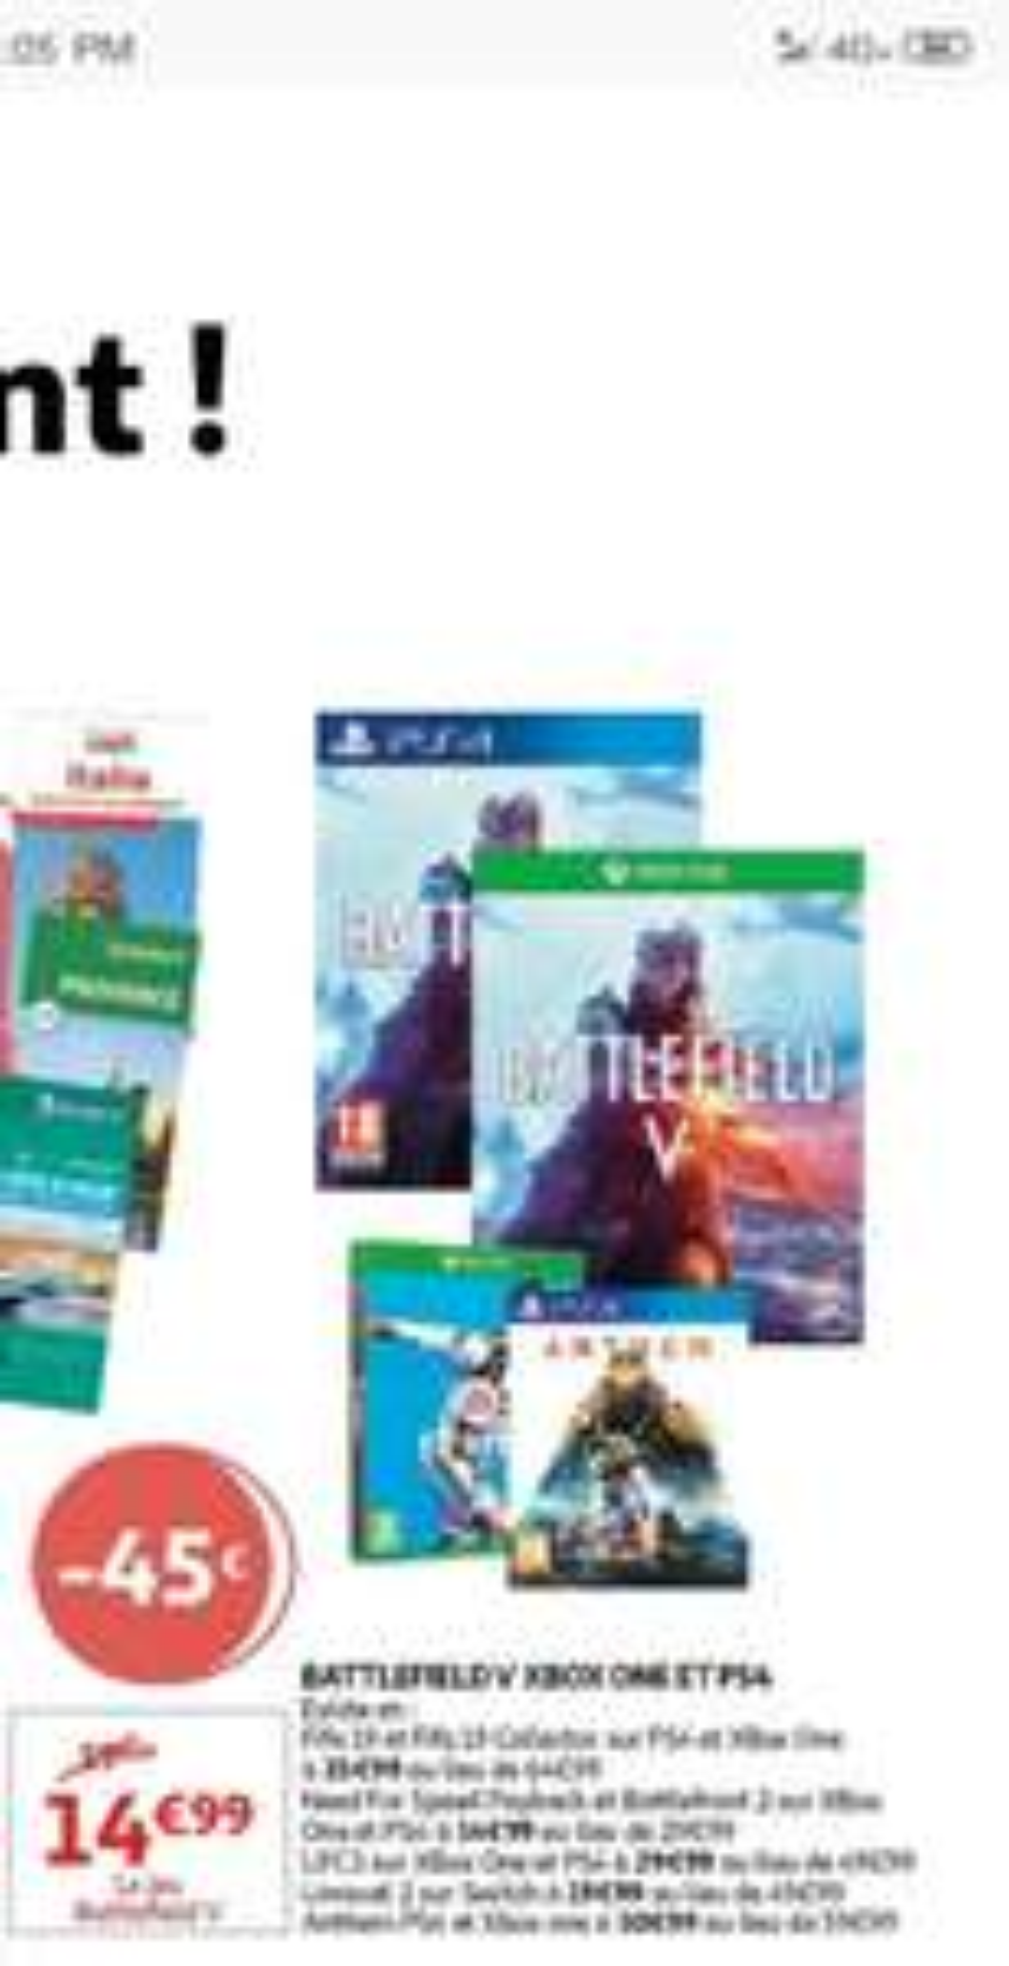 Jeu Battlefield V sur PS4 et Xbox One (Frontaliers Luxembourg)